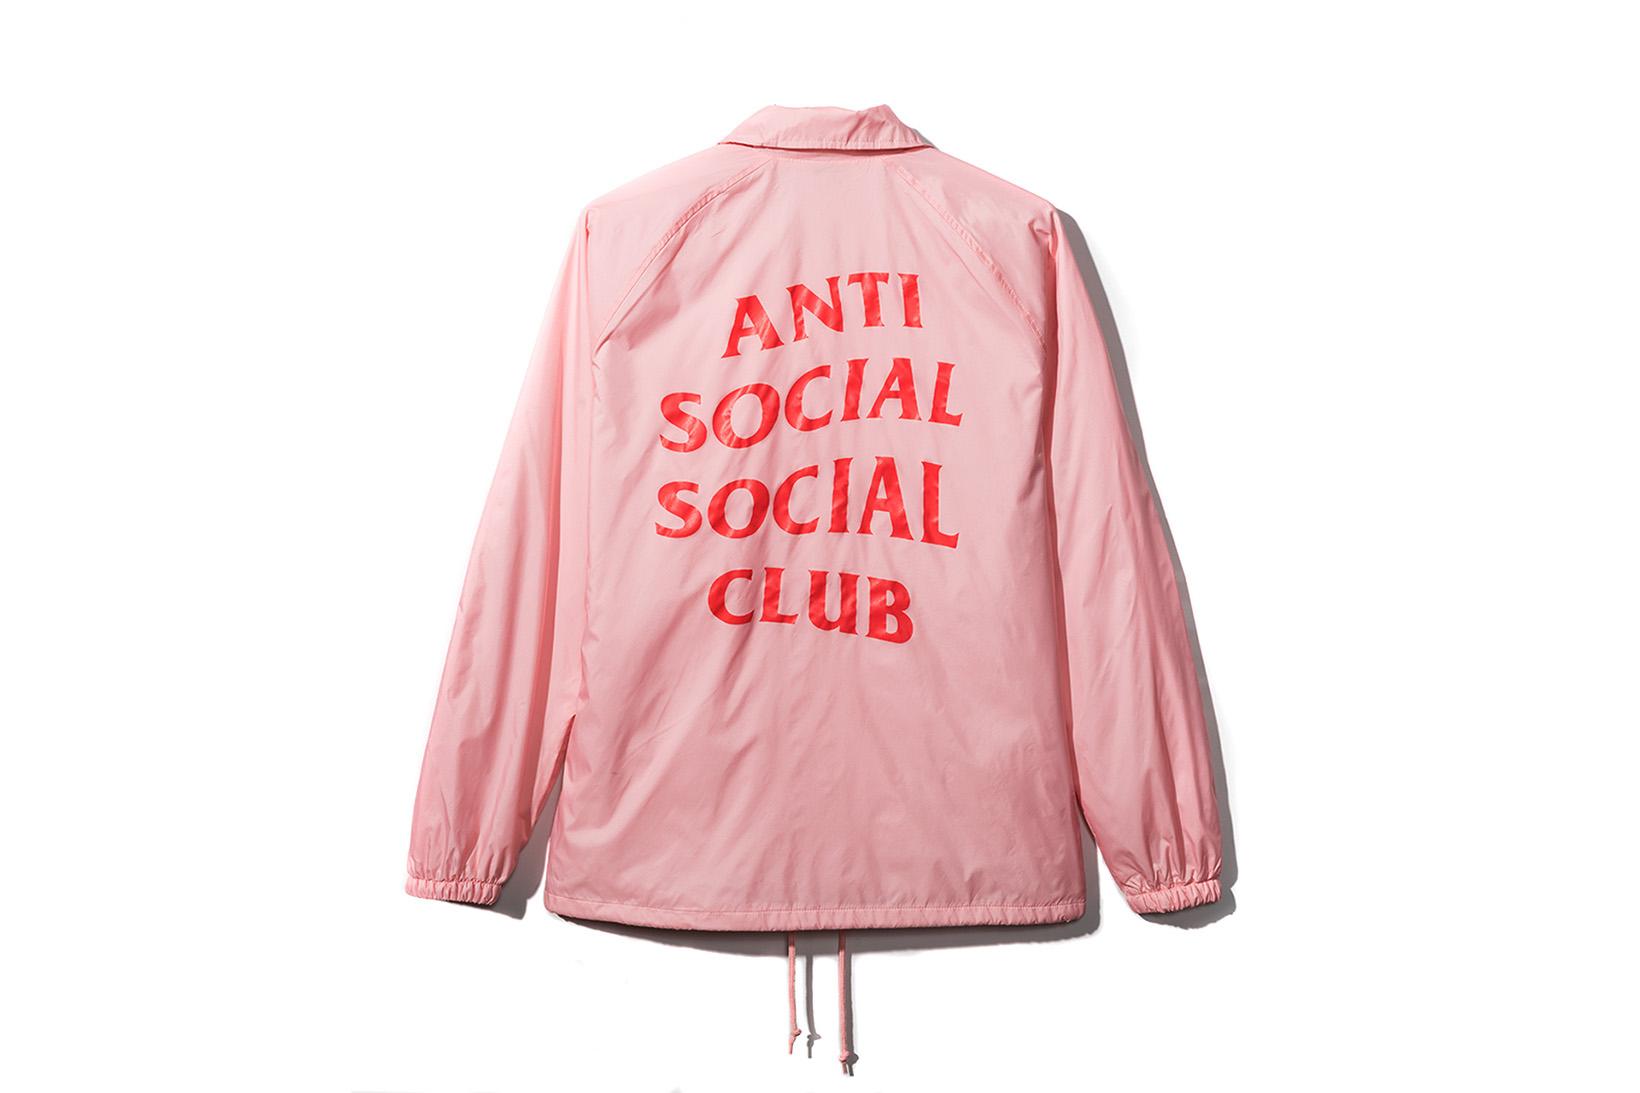 Anti Social Social Club 2017 Spring Summer - 3744322